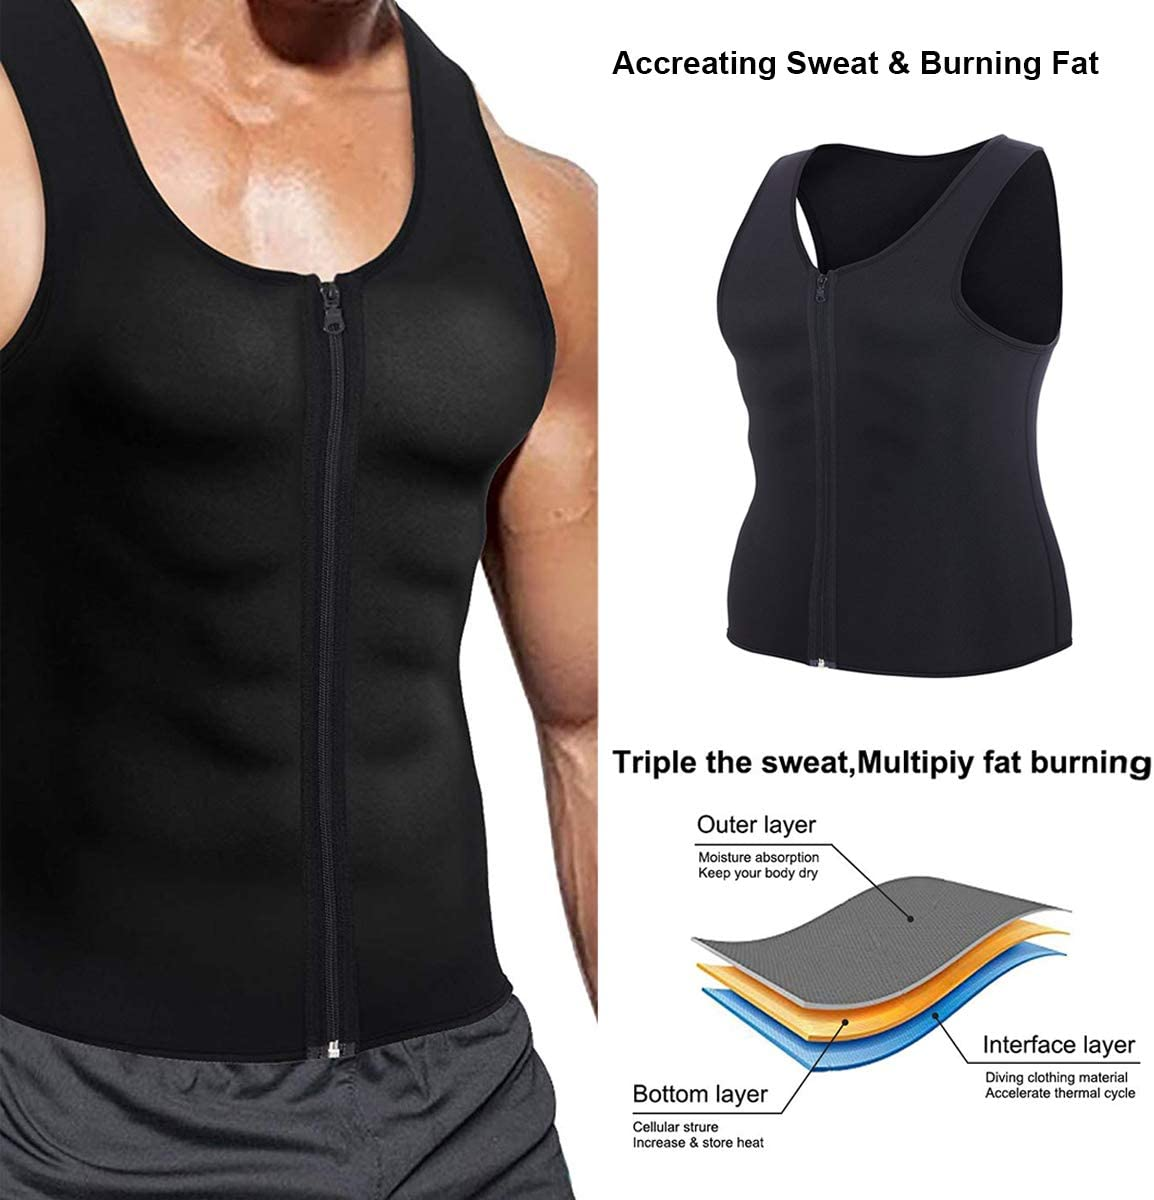 Ufanore Waist Trainer Vest for Men, Hot Neoprene Sauna Vest with Zipper, Sauna Tank Top Workout Shirt for Weight Loss